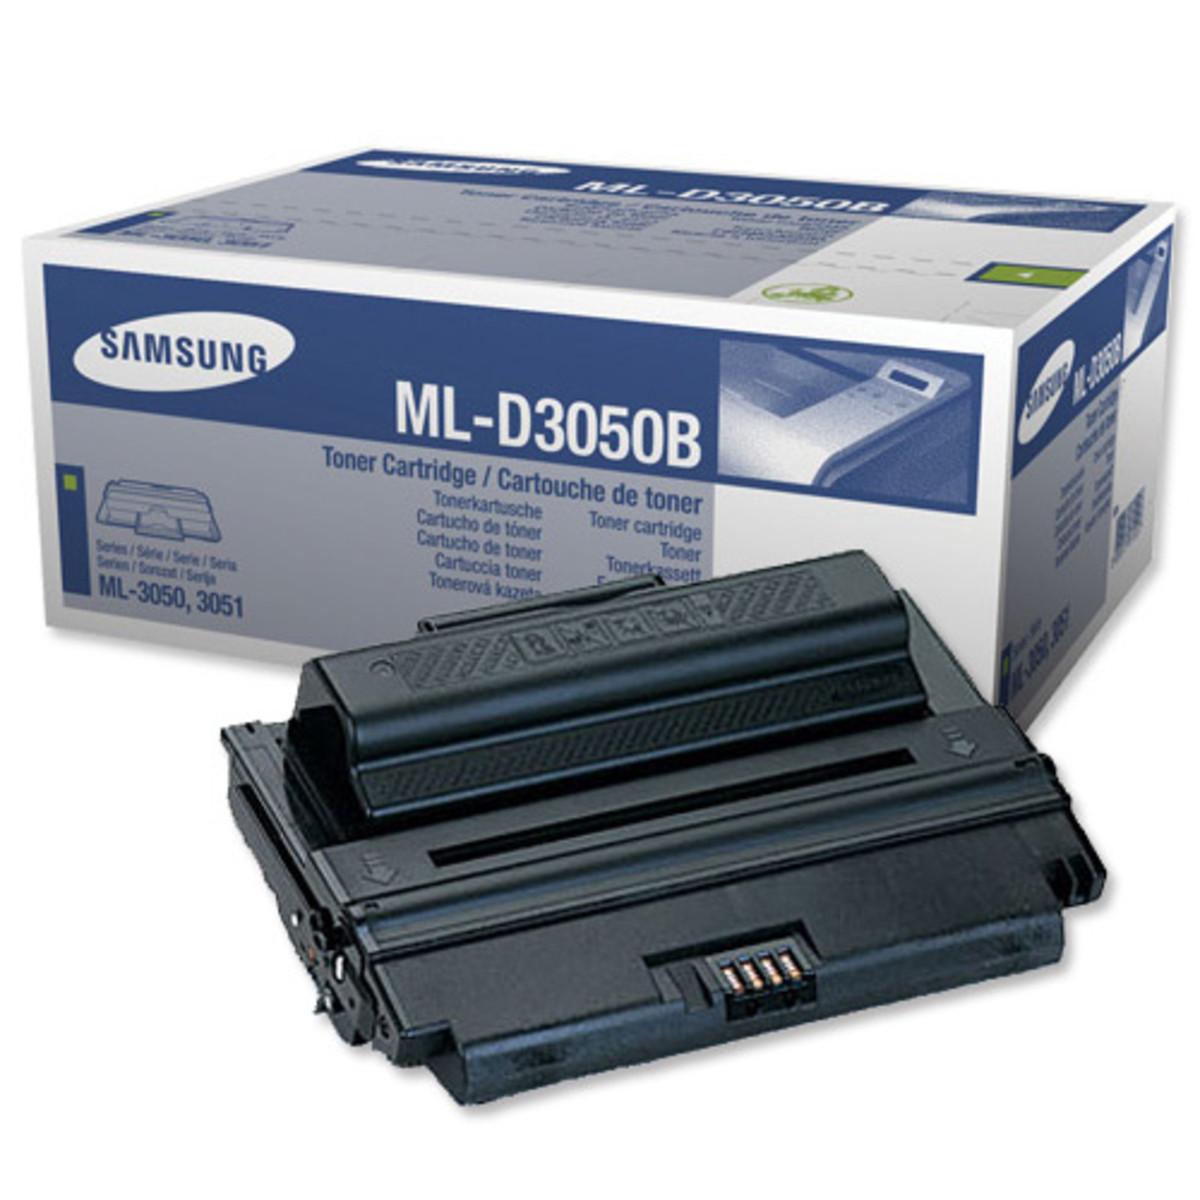 Samsung ML-D3050B Black Toner Cartridge